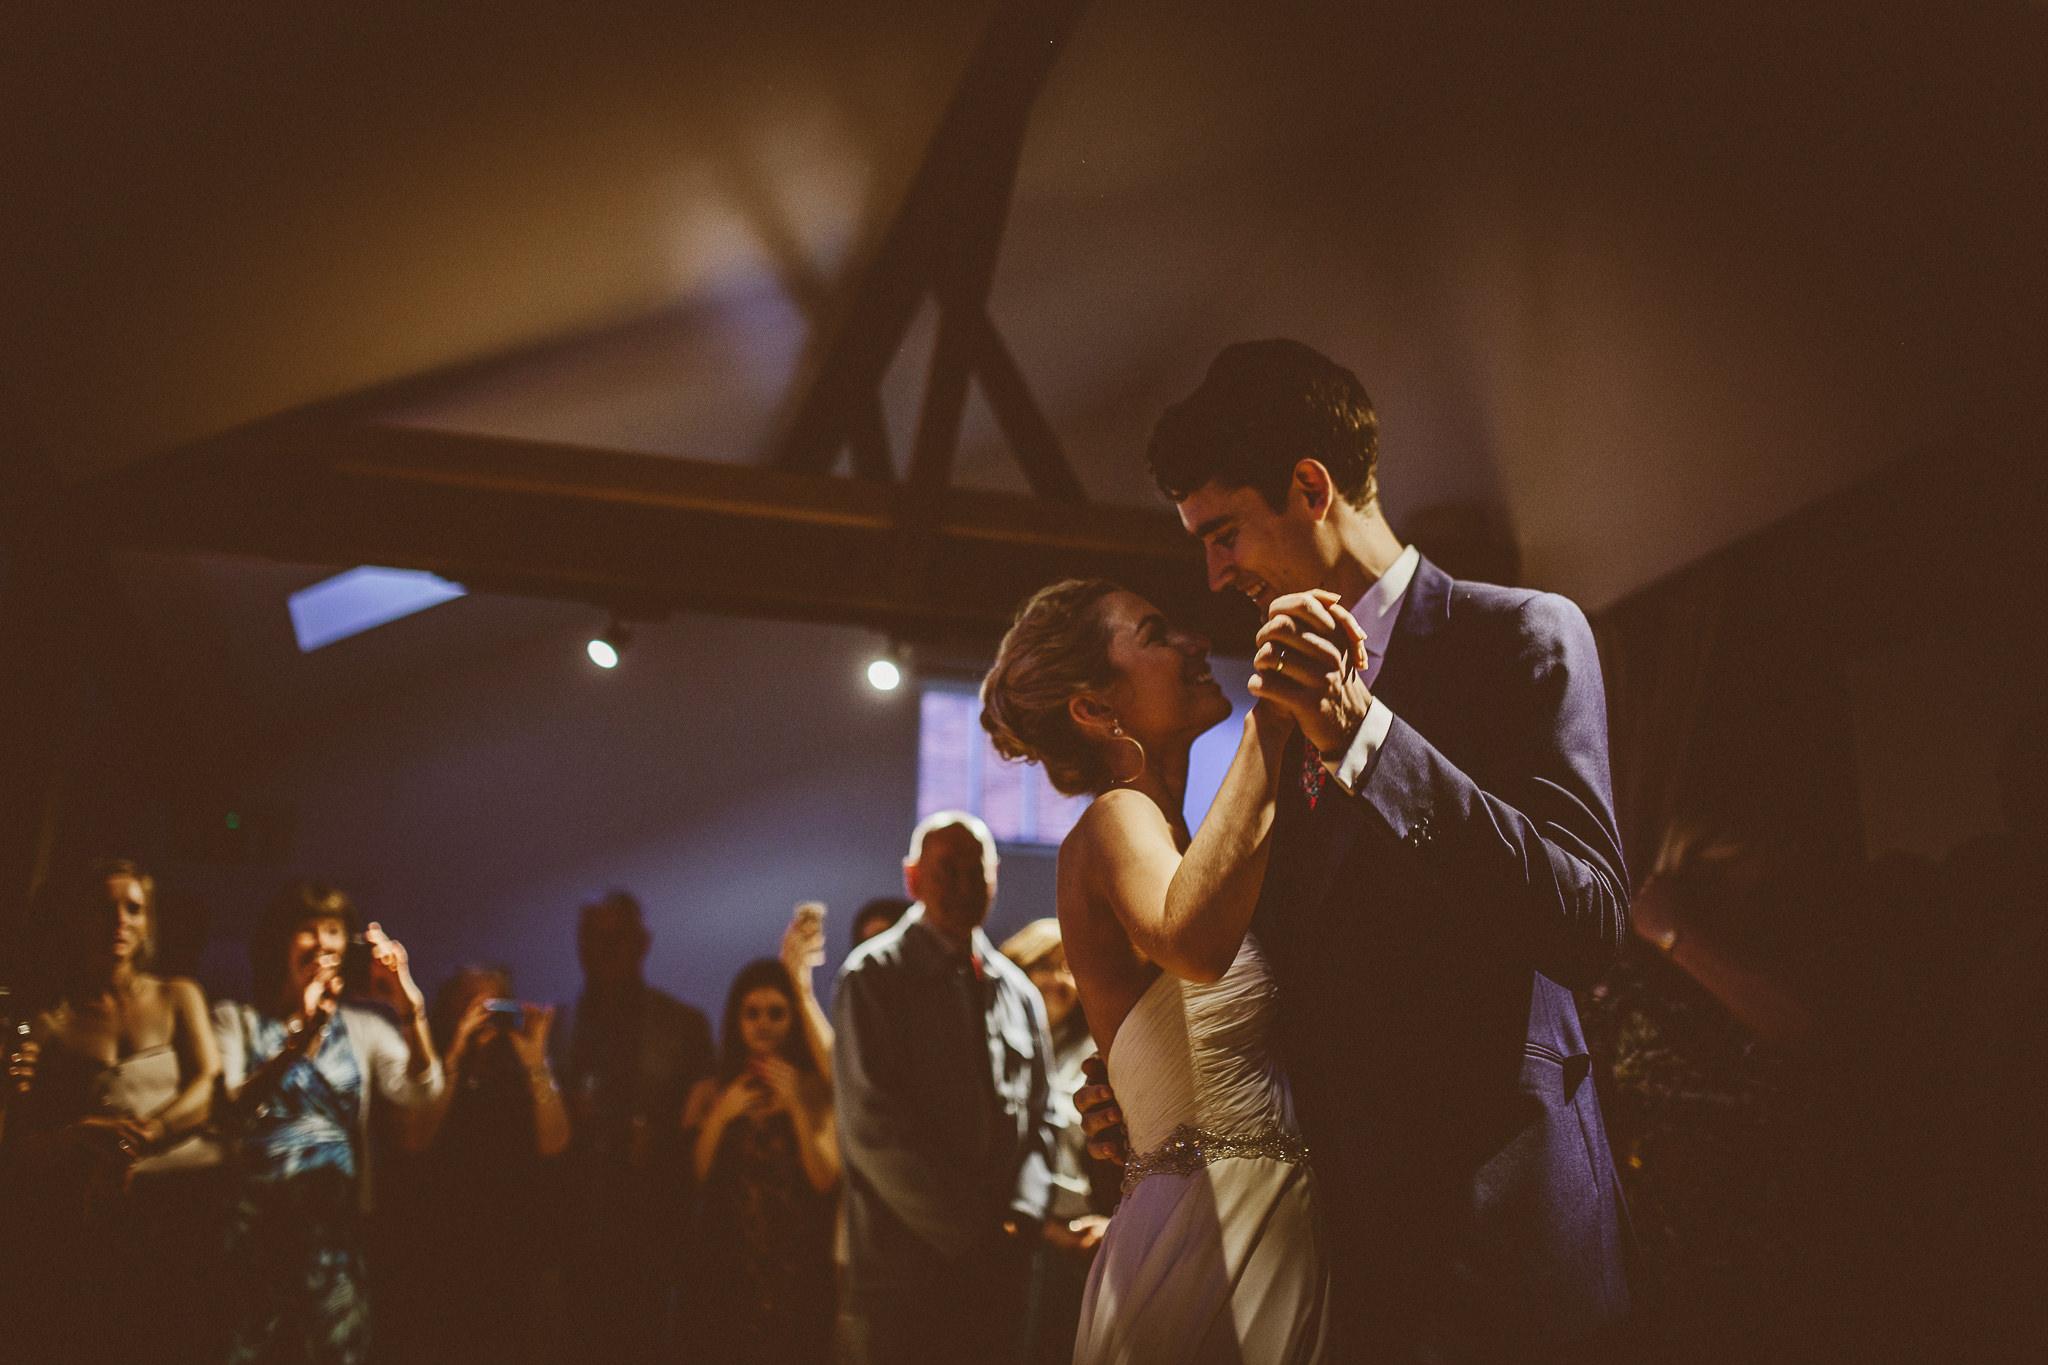 paul-marbrook-Gaynes-Park Wedding-Photographer-90141